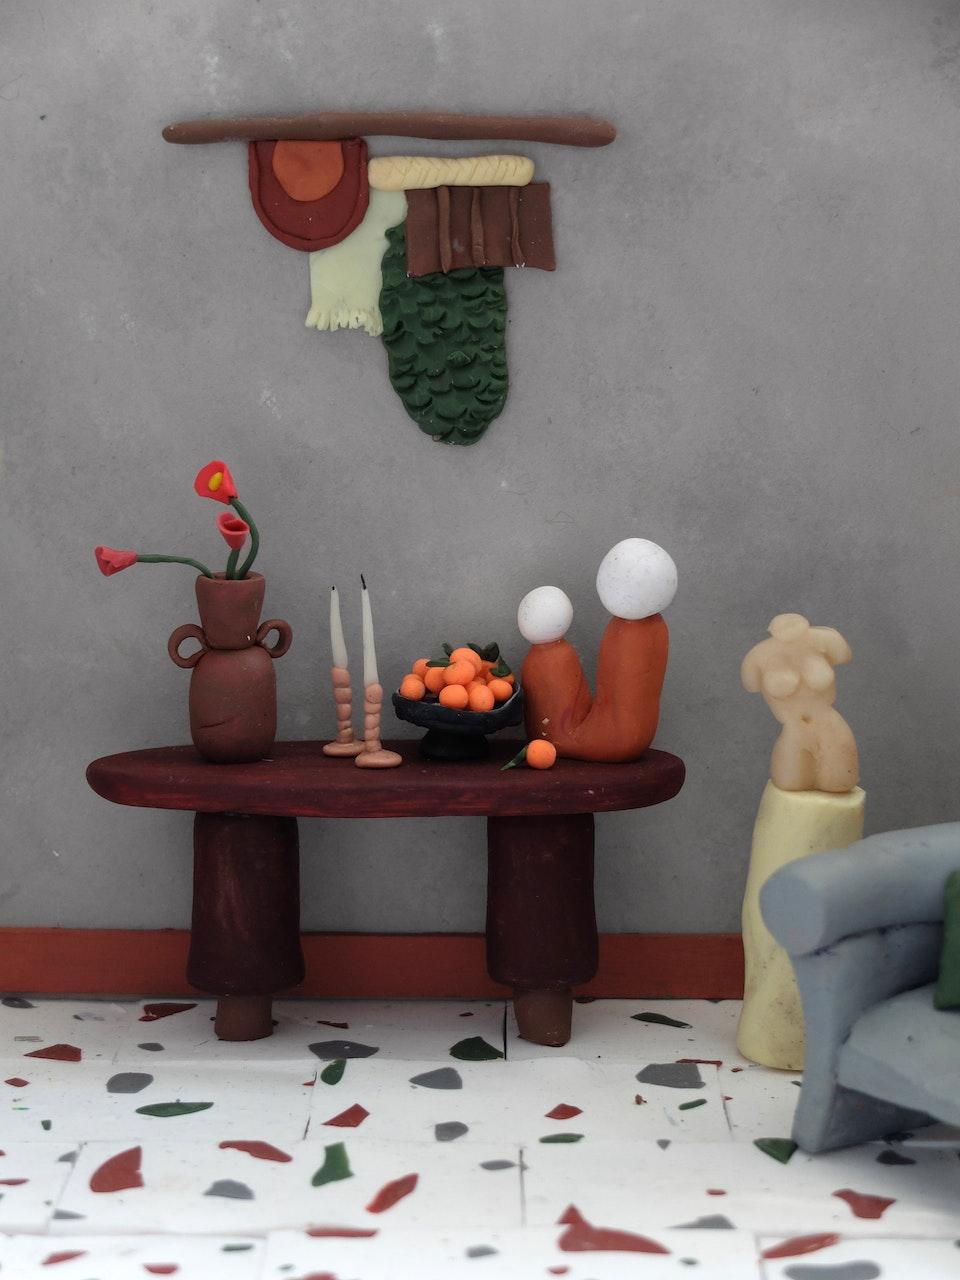 Production Designer: Phoebe Anne Harris: 'Teeny Tiny House of Clay' - DSCF8720 2